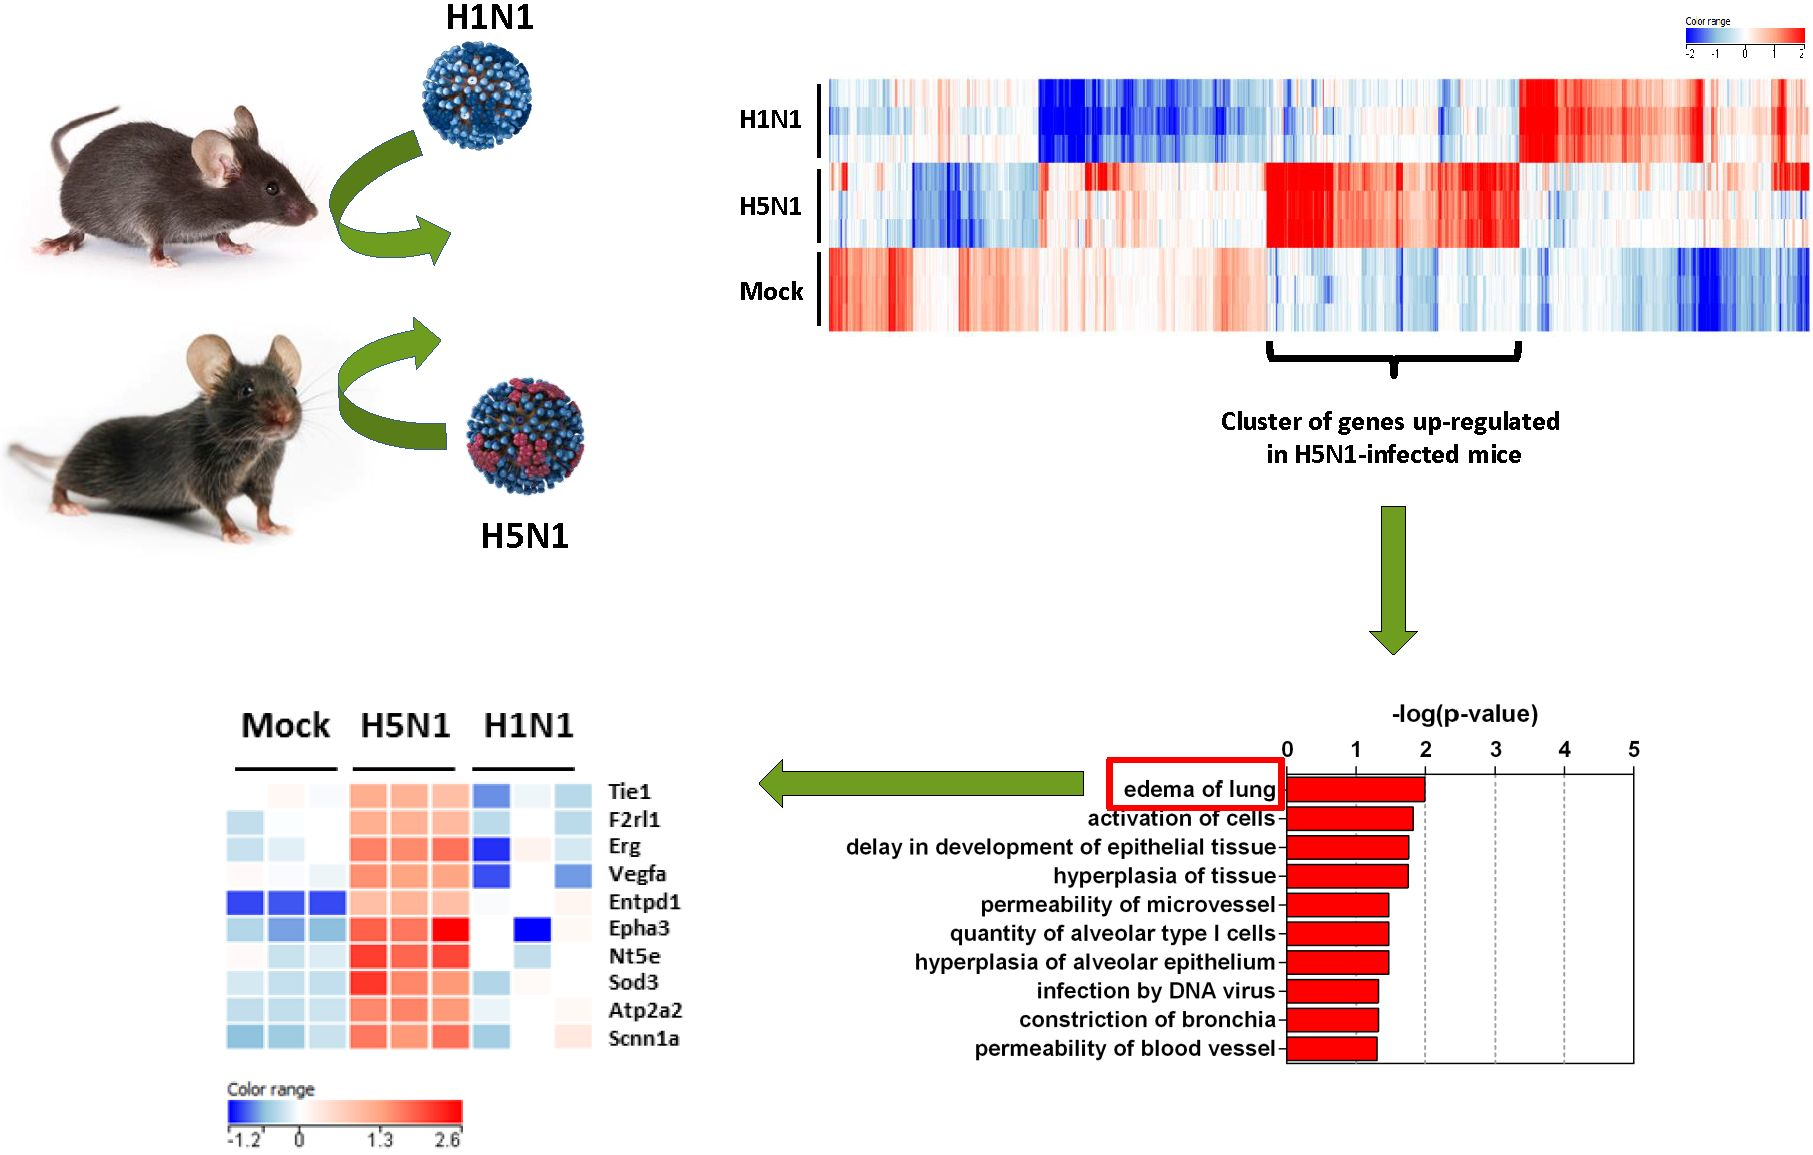 Research on Zoonotic (Animal Origin) Influenza (Flu) Viruses of Public Health Concern